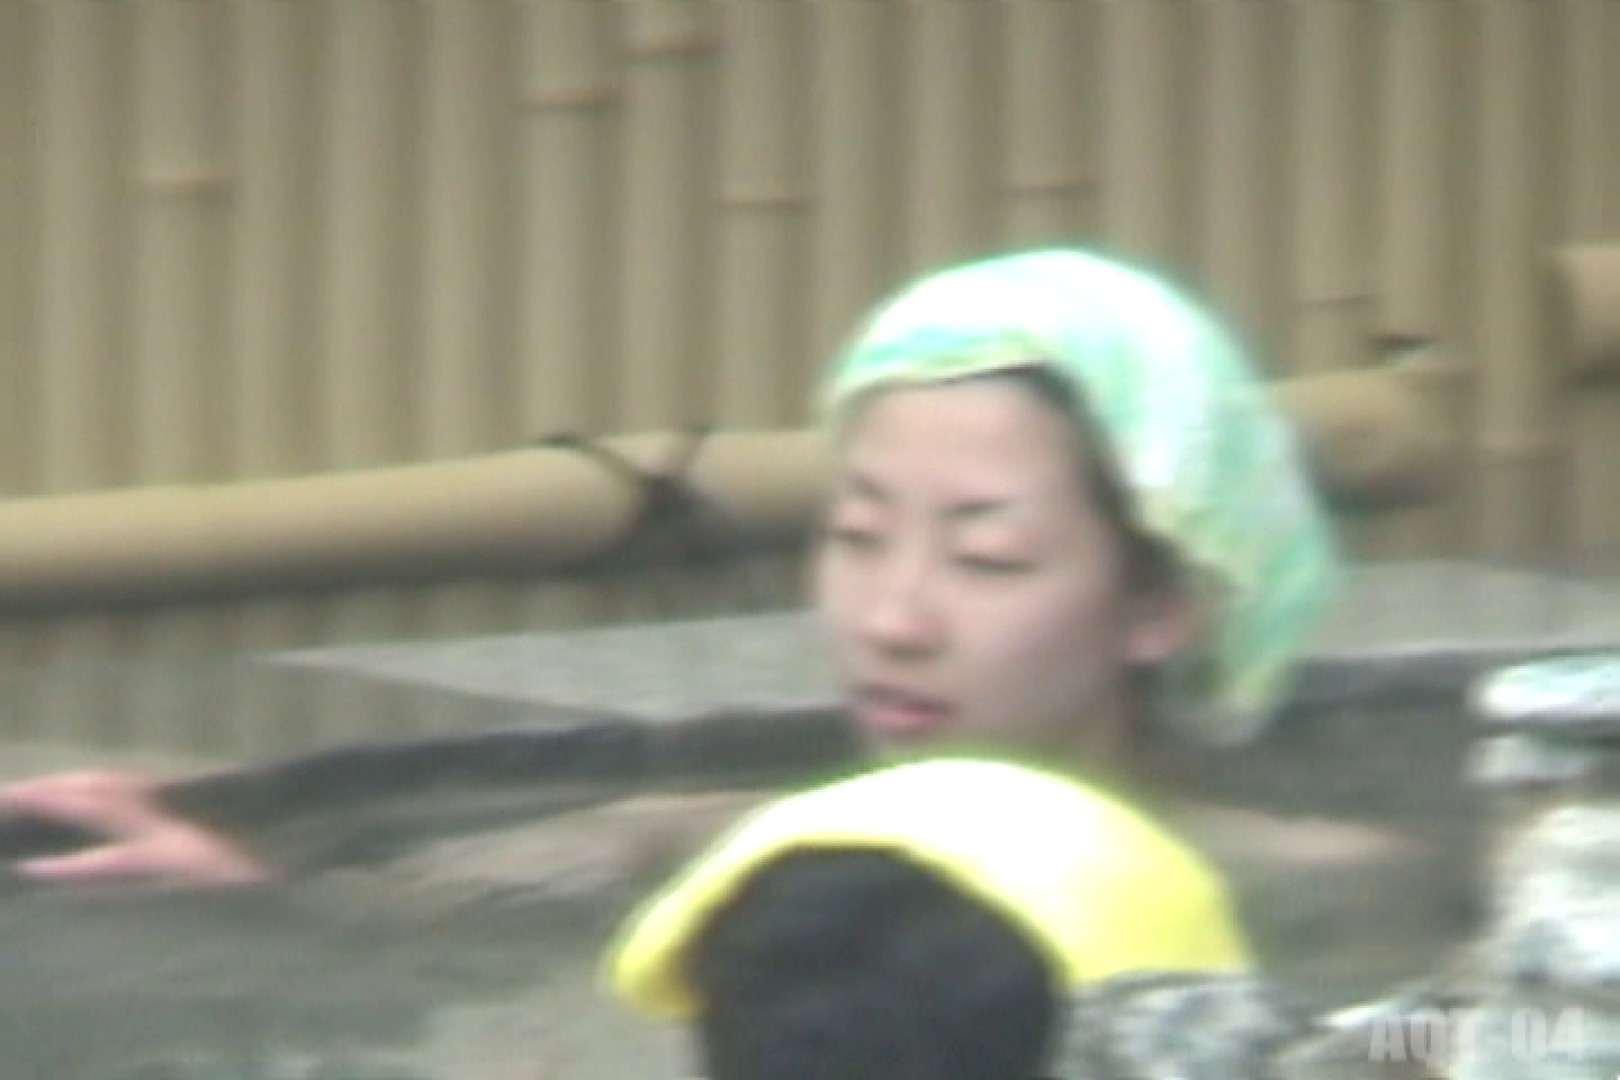 Aquaな露天風呂Vol.739 露天風呂突入 | 盗撮師作品  88pic 1